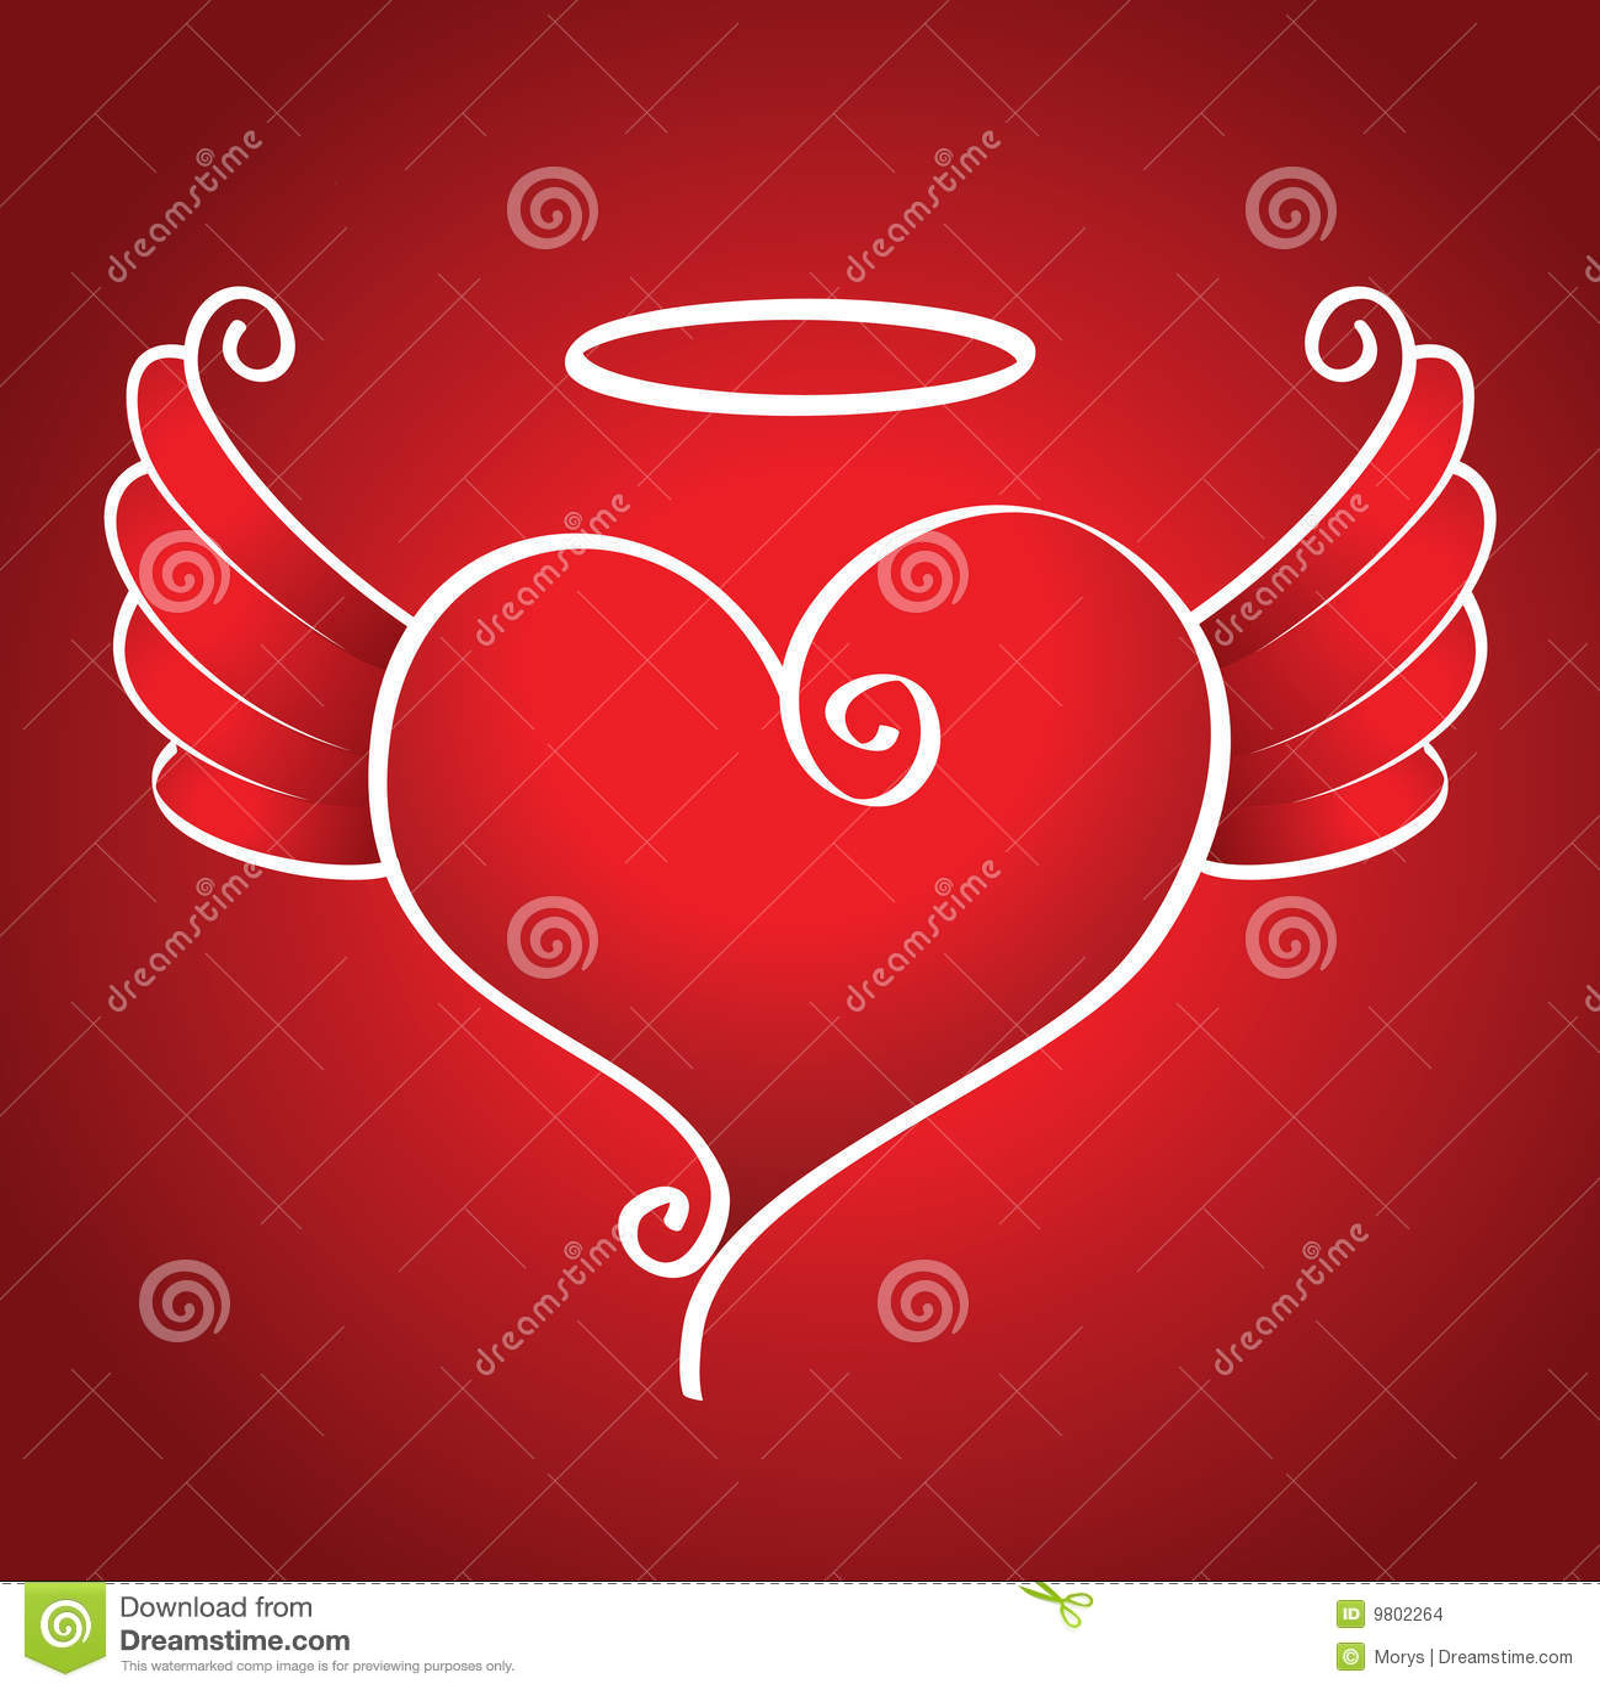 Kind heart stock vector. Illustration of romance, sacred ...